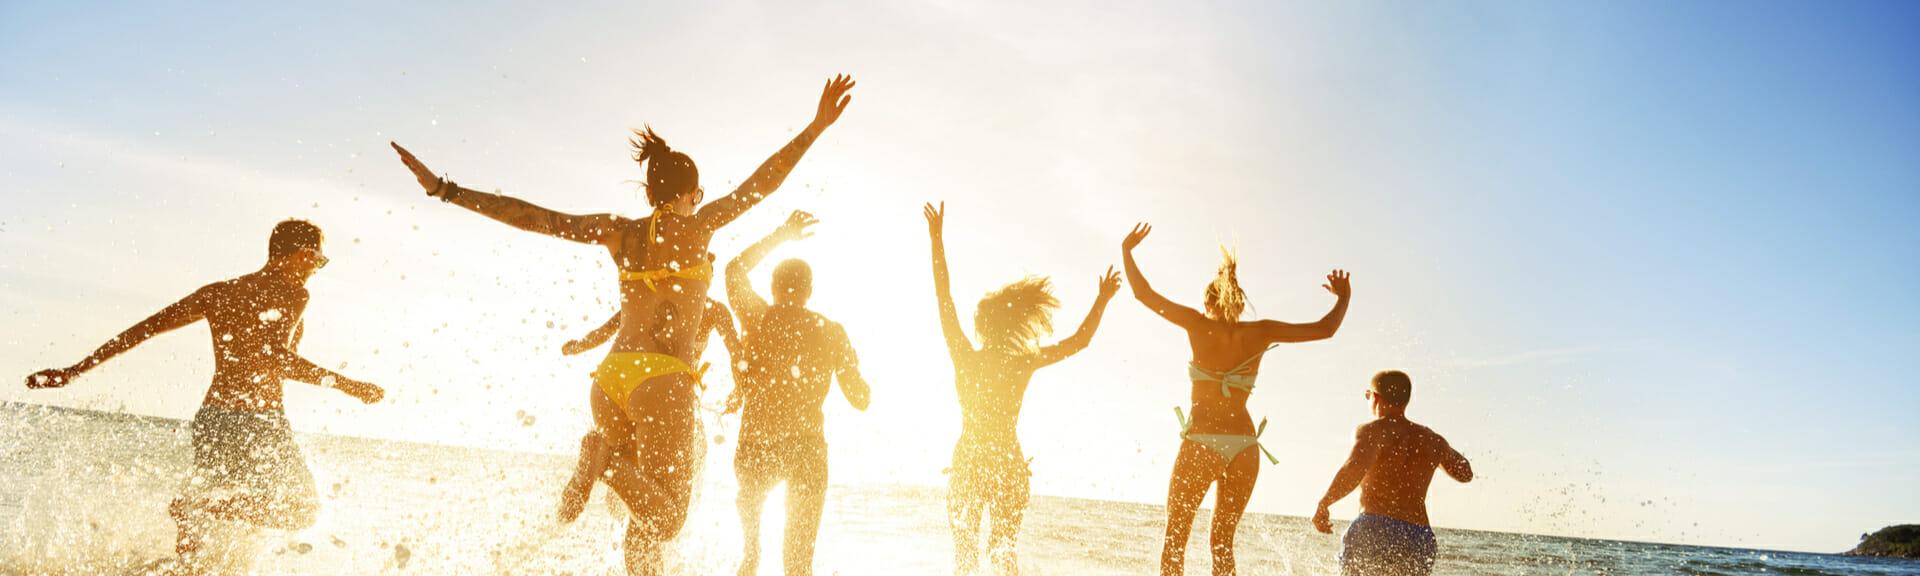 Klassenfahrt Cuxhaven begeisterte Schülergruppe am See